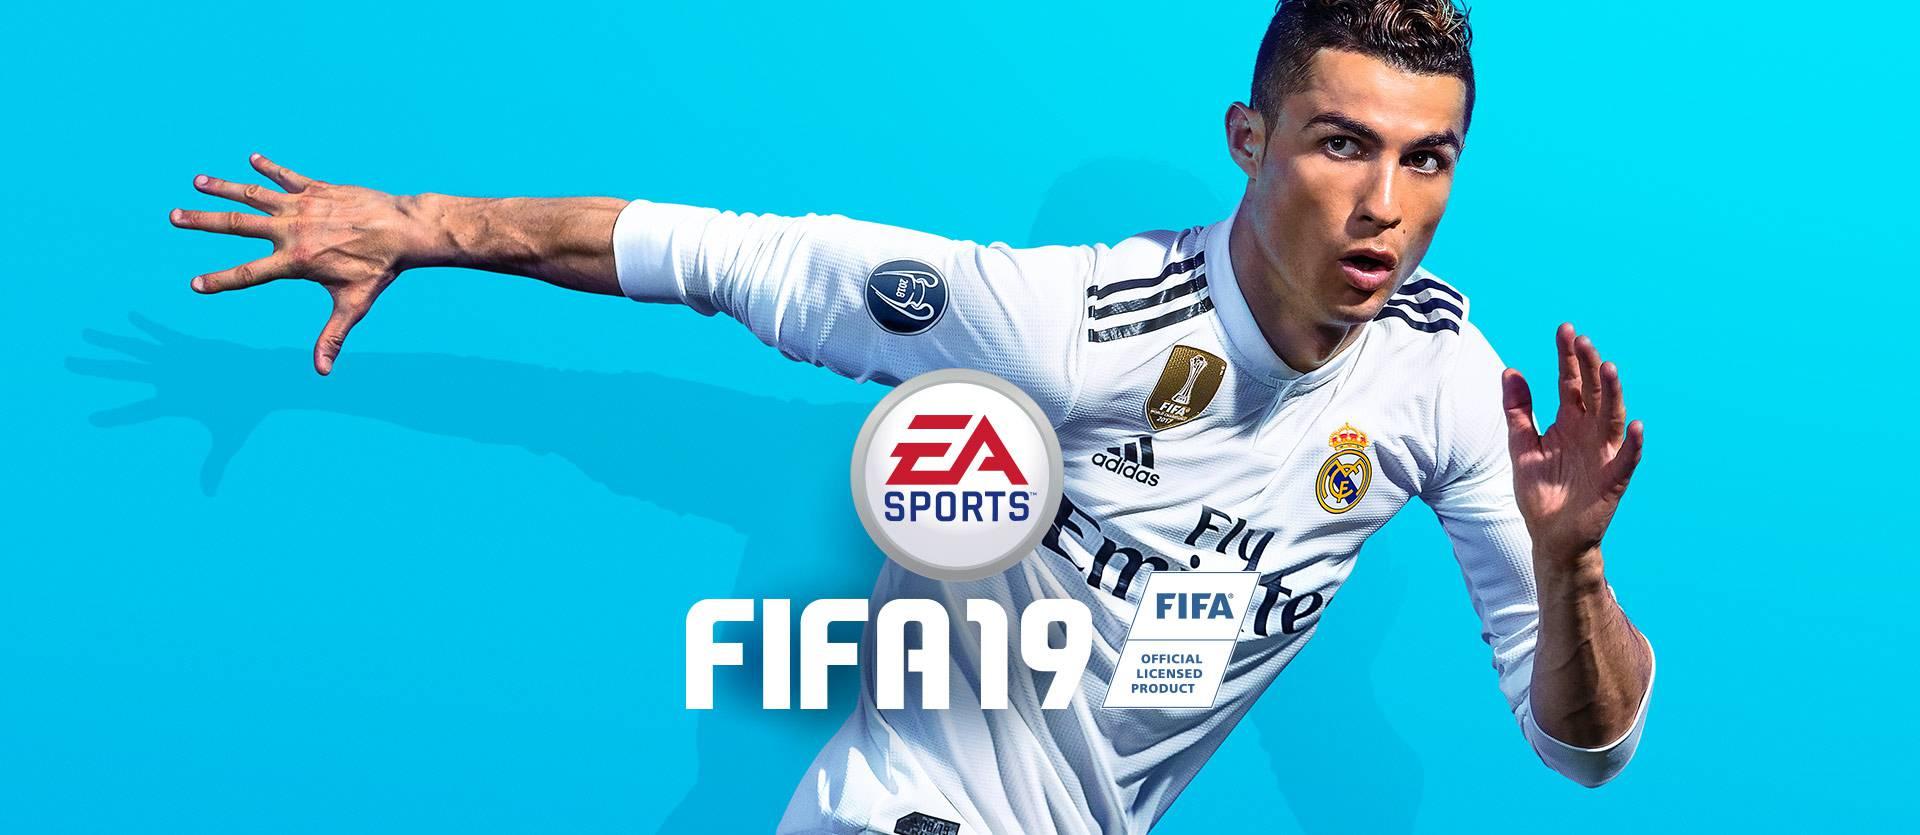 ae1d7f1a 757c 4200 9029 eddcb8099ca2 Η Nintendo ανακοίνωσε τα παιχνίδια για τη Gamescom 2018   Geekdom News